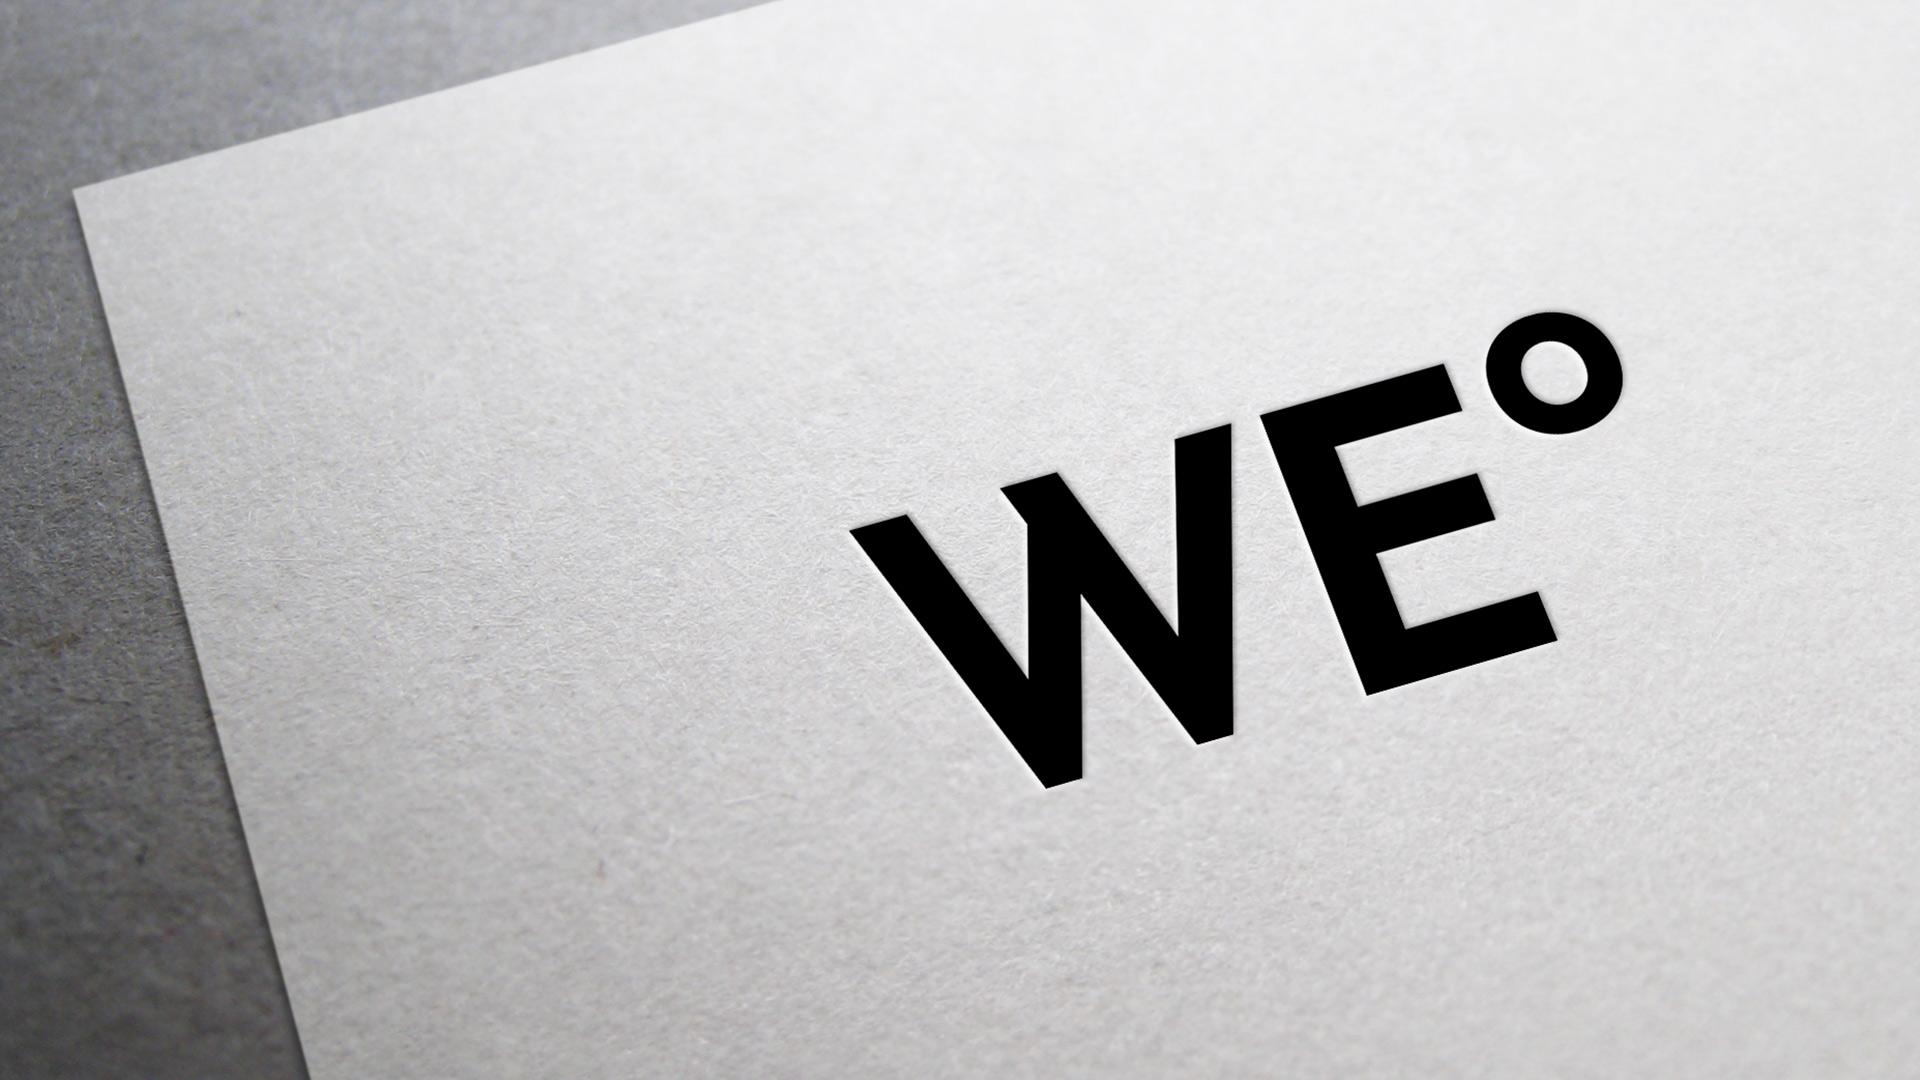 WE° 网站的logo设计效果-Flow Asia